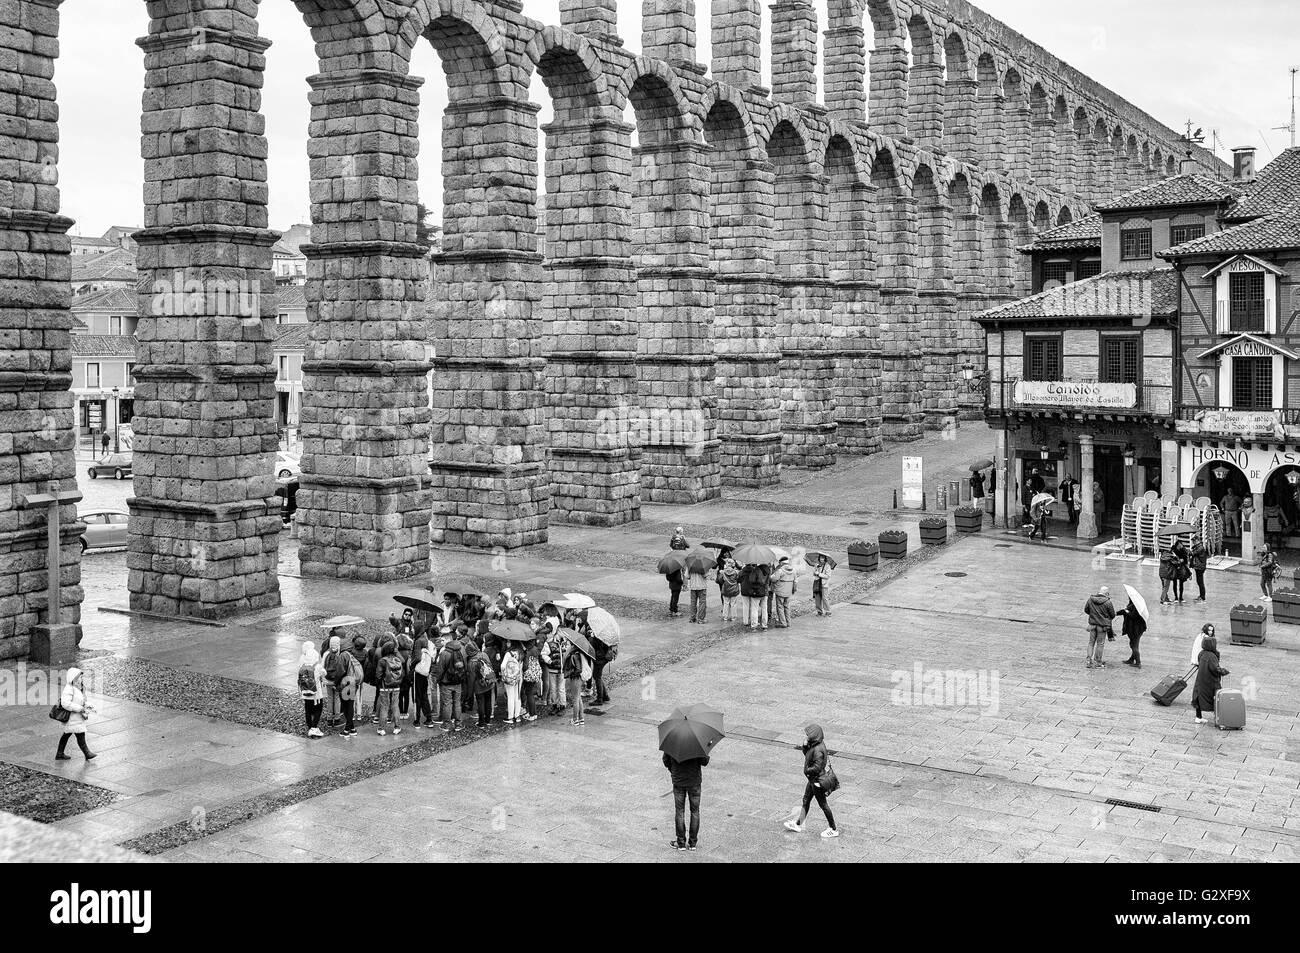 Roman aqueduct in Segovia, Castile and Leon, Spain - Stock Image